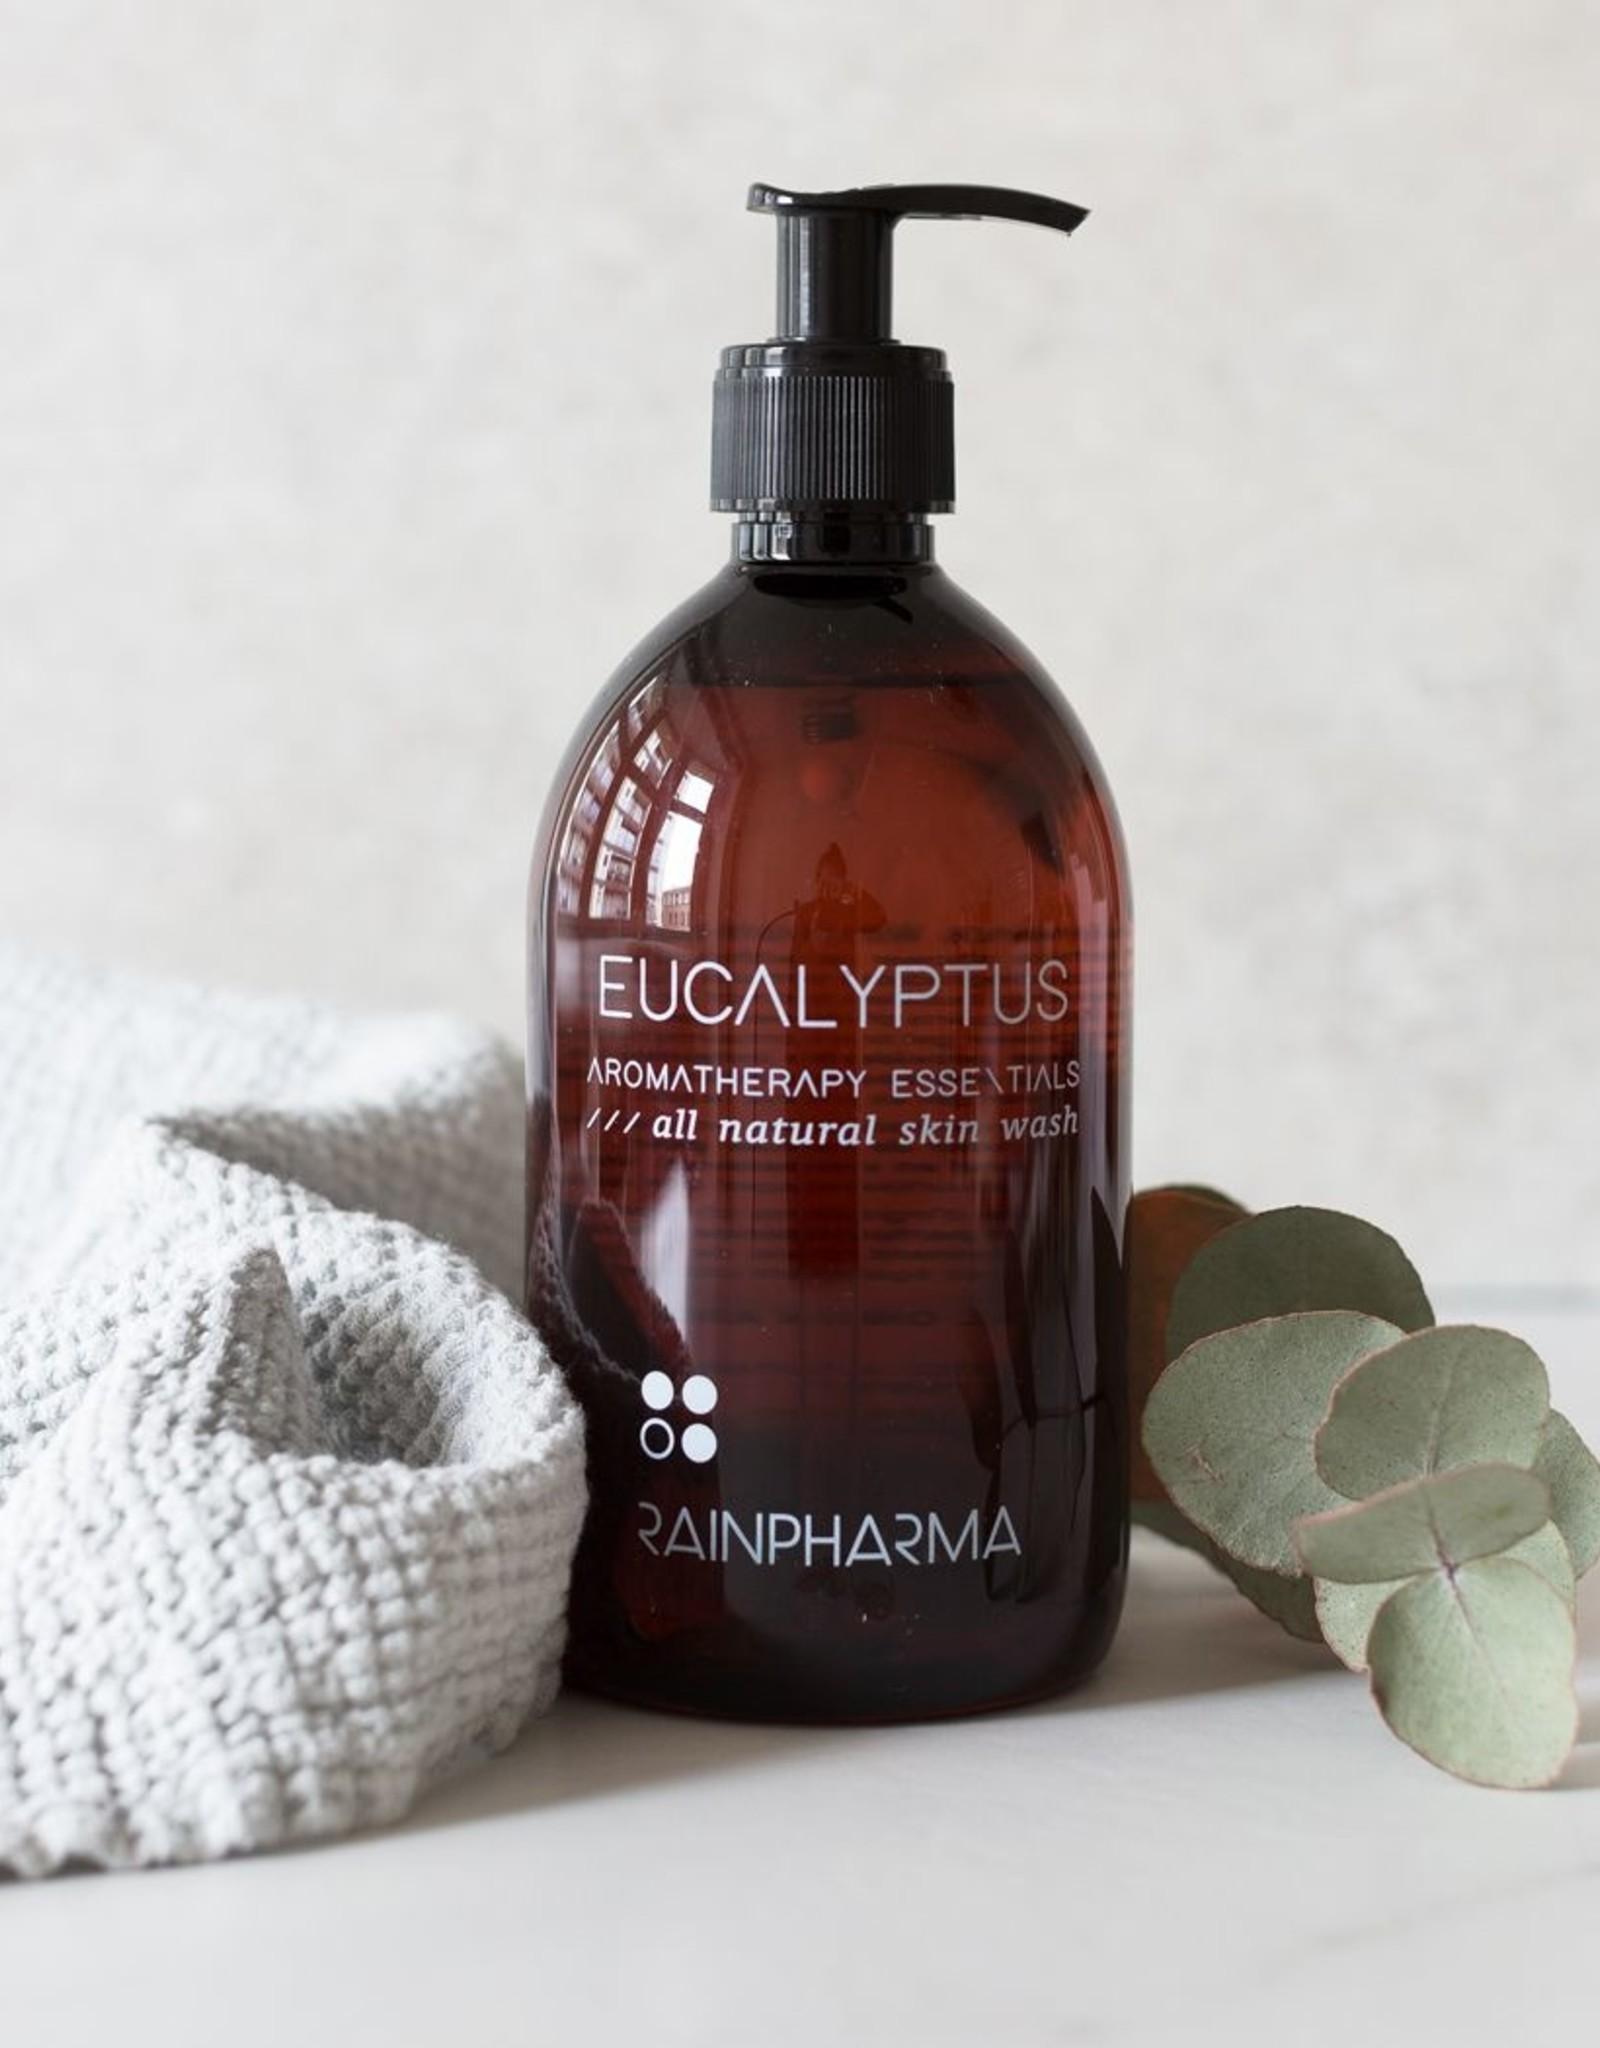 RainPharma Rainpharma - Skin Wash Eucalyptus 500ml